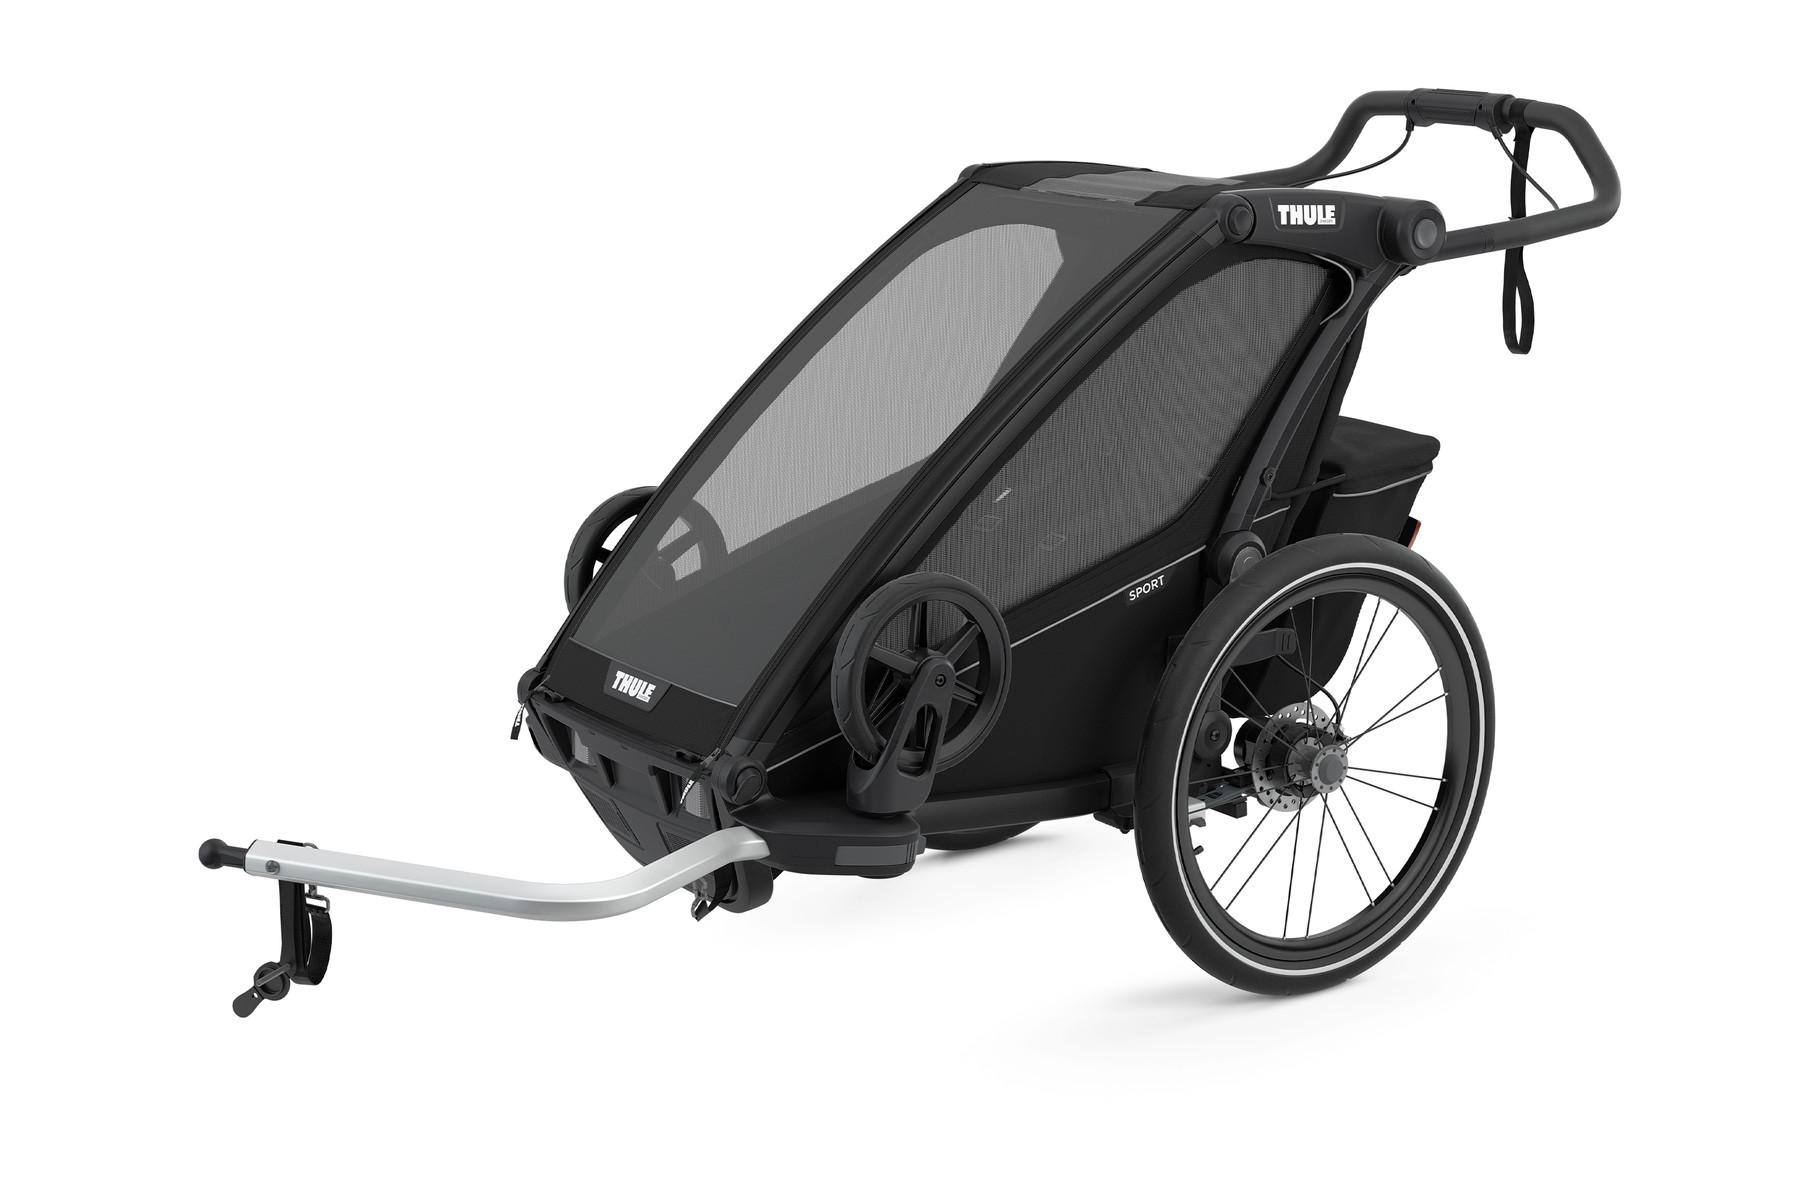 Thule Chariot Sport 1 midnight-black 2021